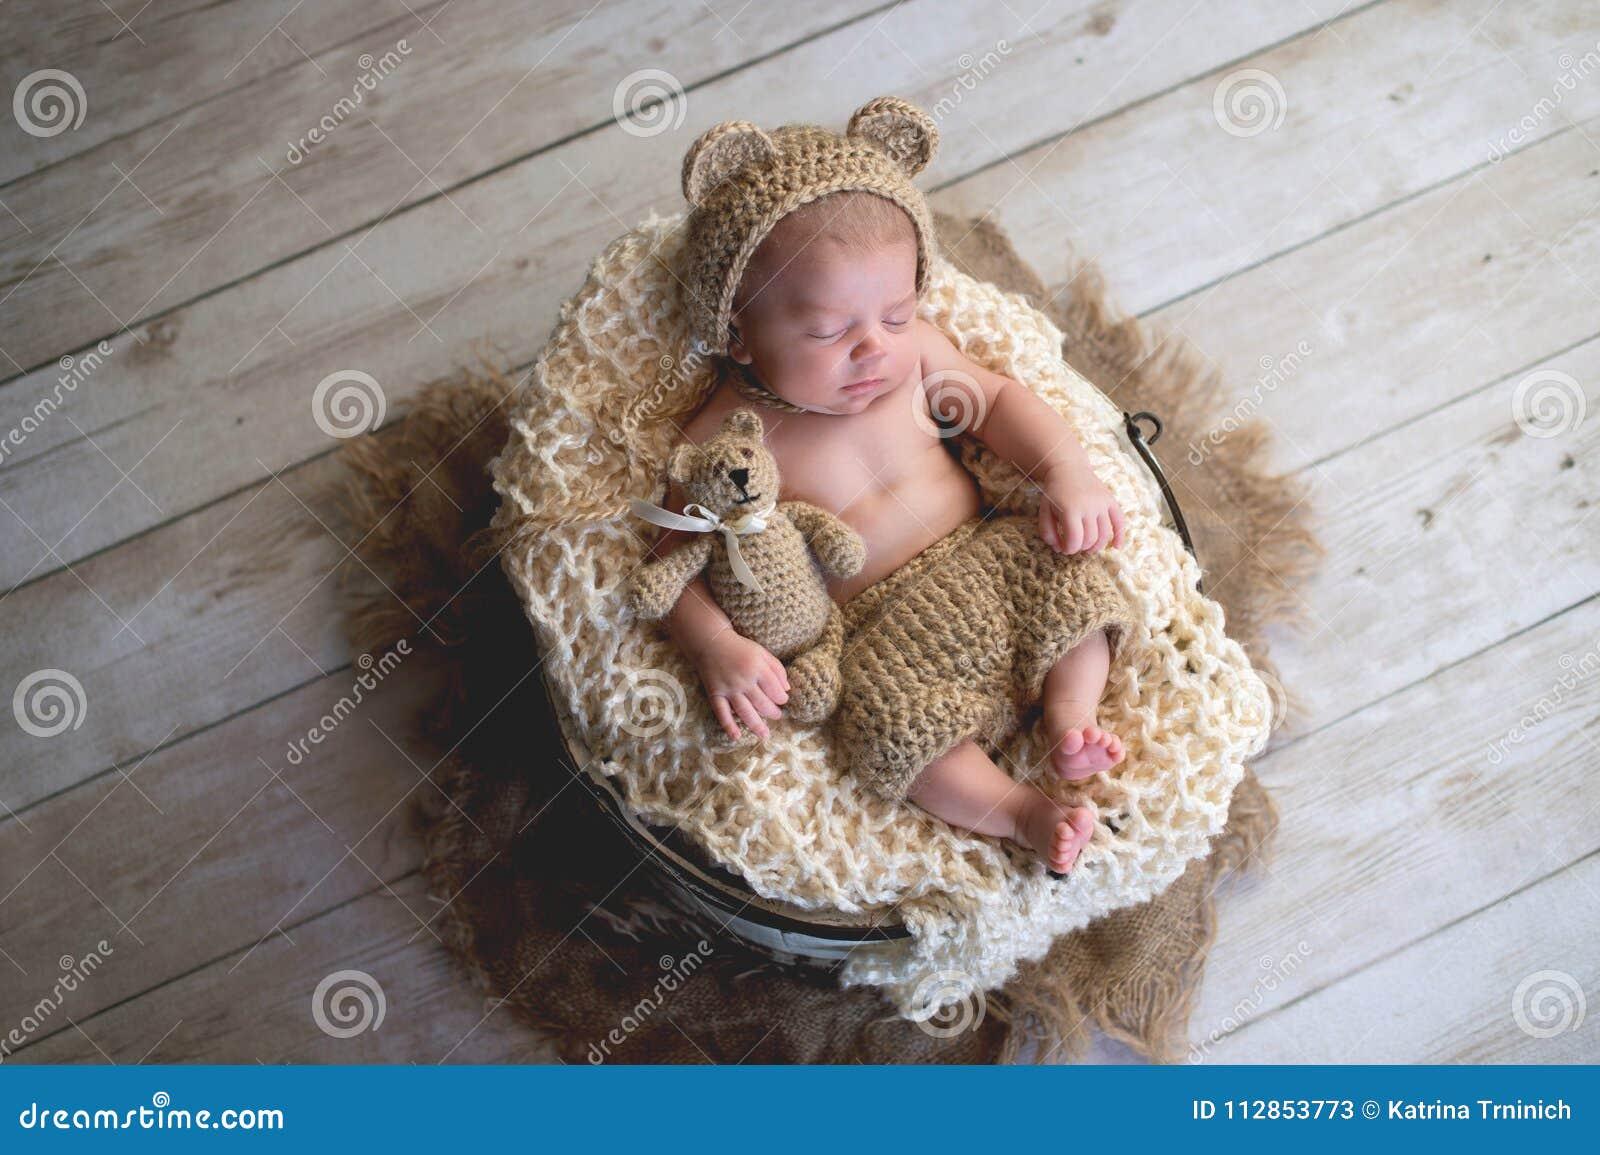 Crochet Baby Hats Fuzzy Teddy Bear Hat with ears - White | 955x1300